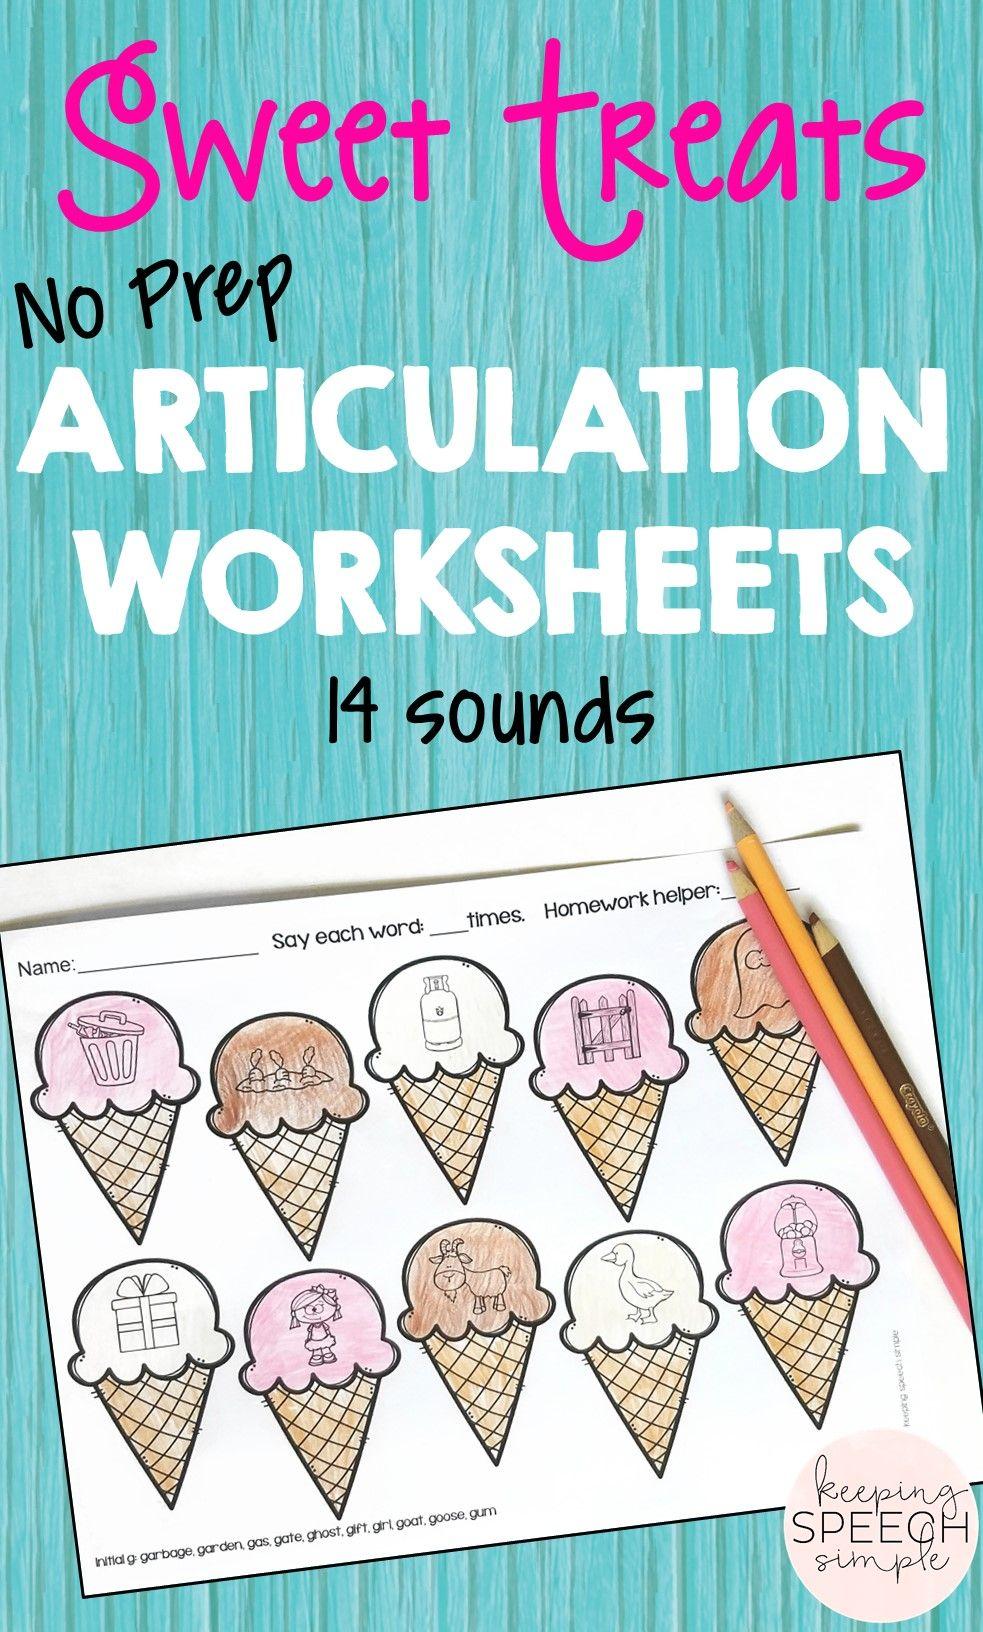 Speech Homework Worksheets Images - worksheet for kids maths printing